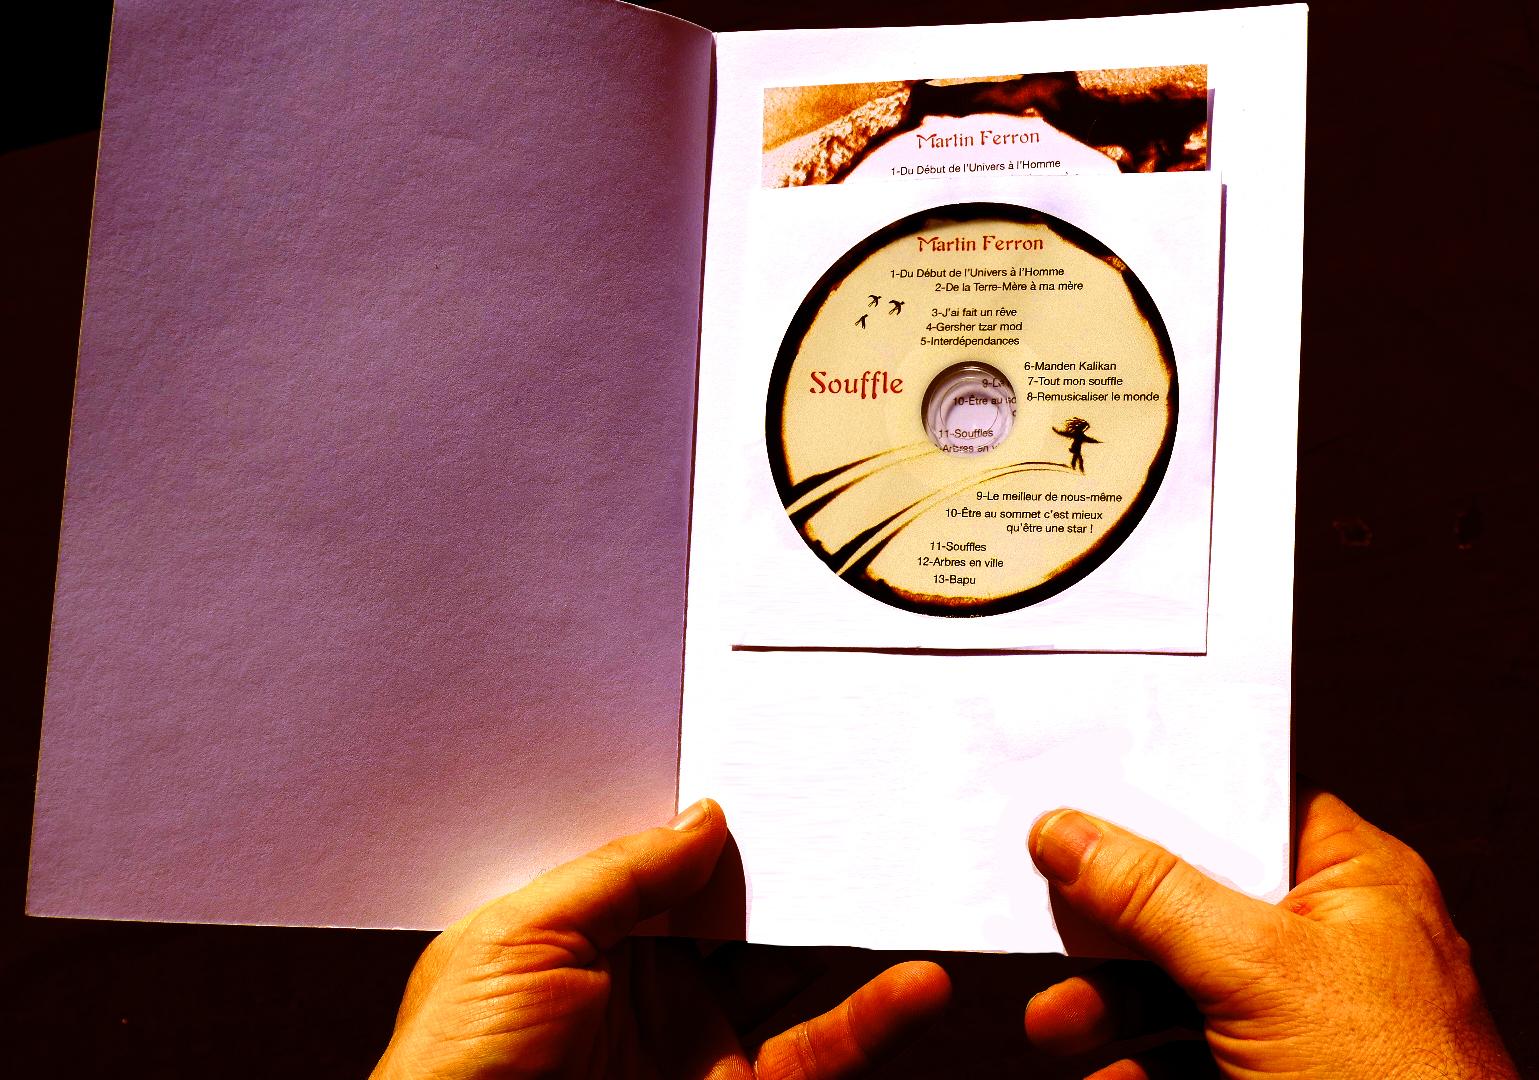 Livre-CD SOUFFLE Martin Ferron page 1